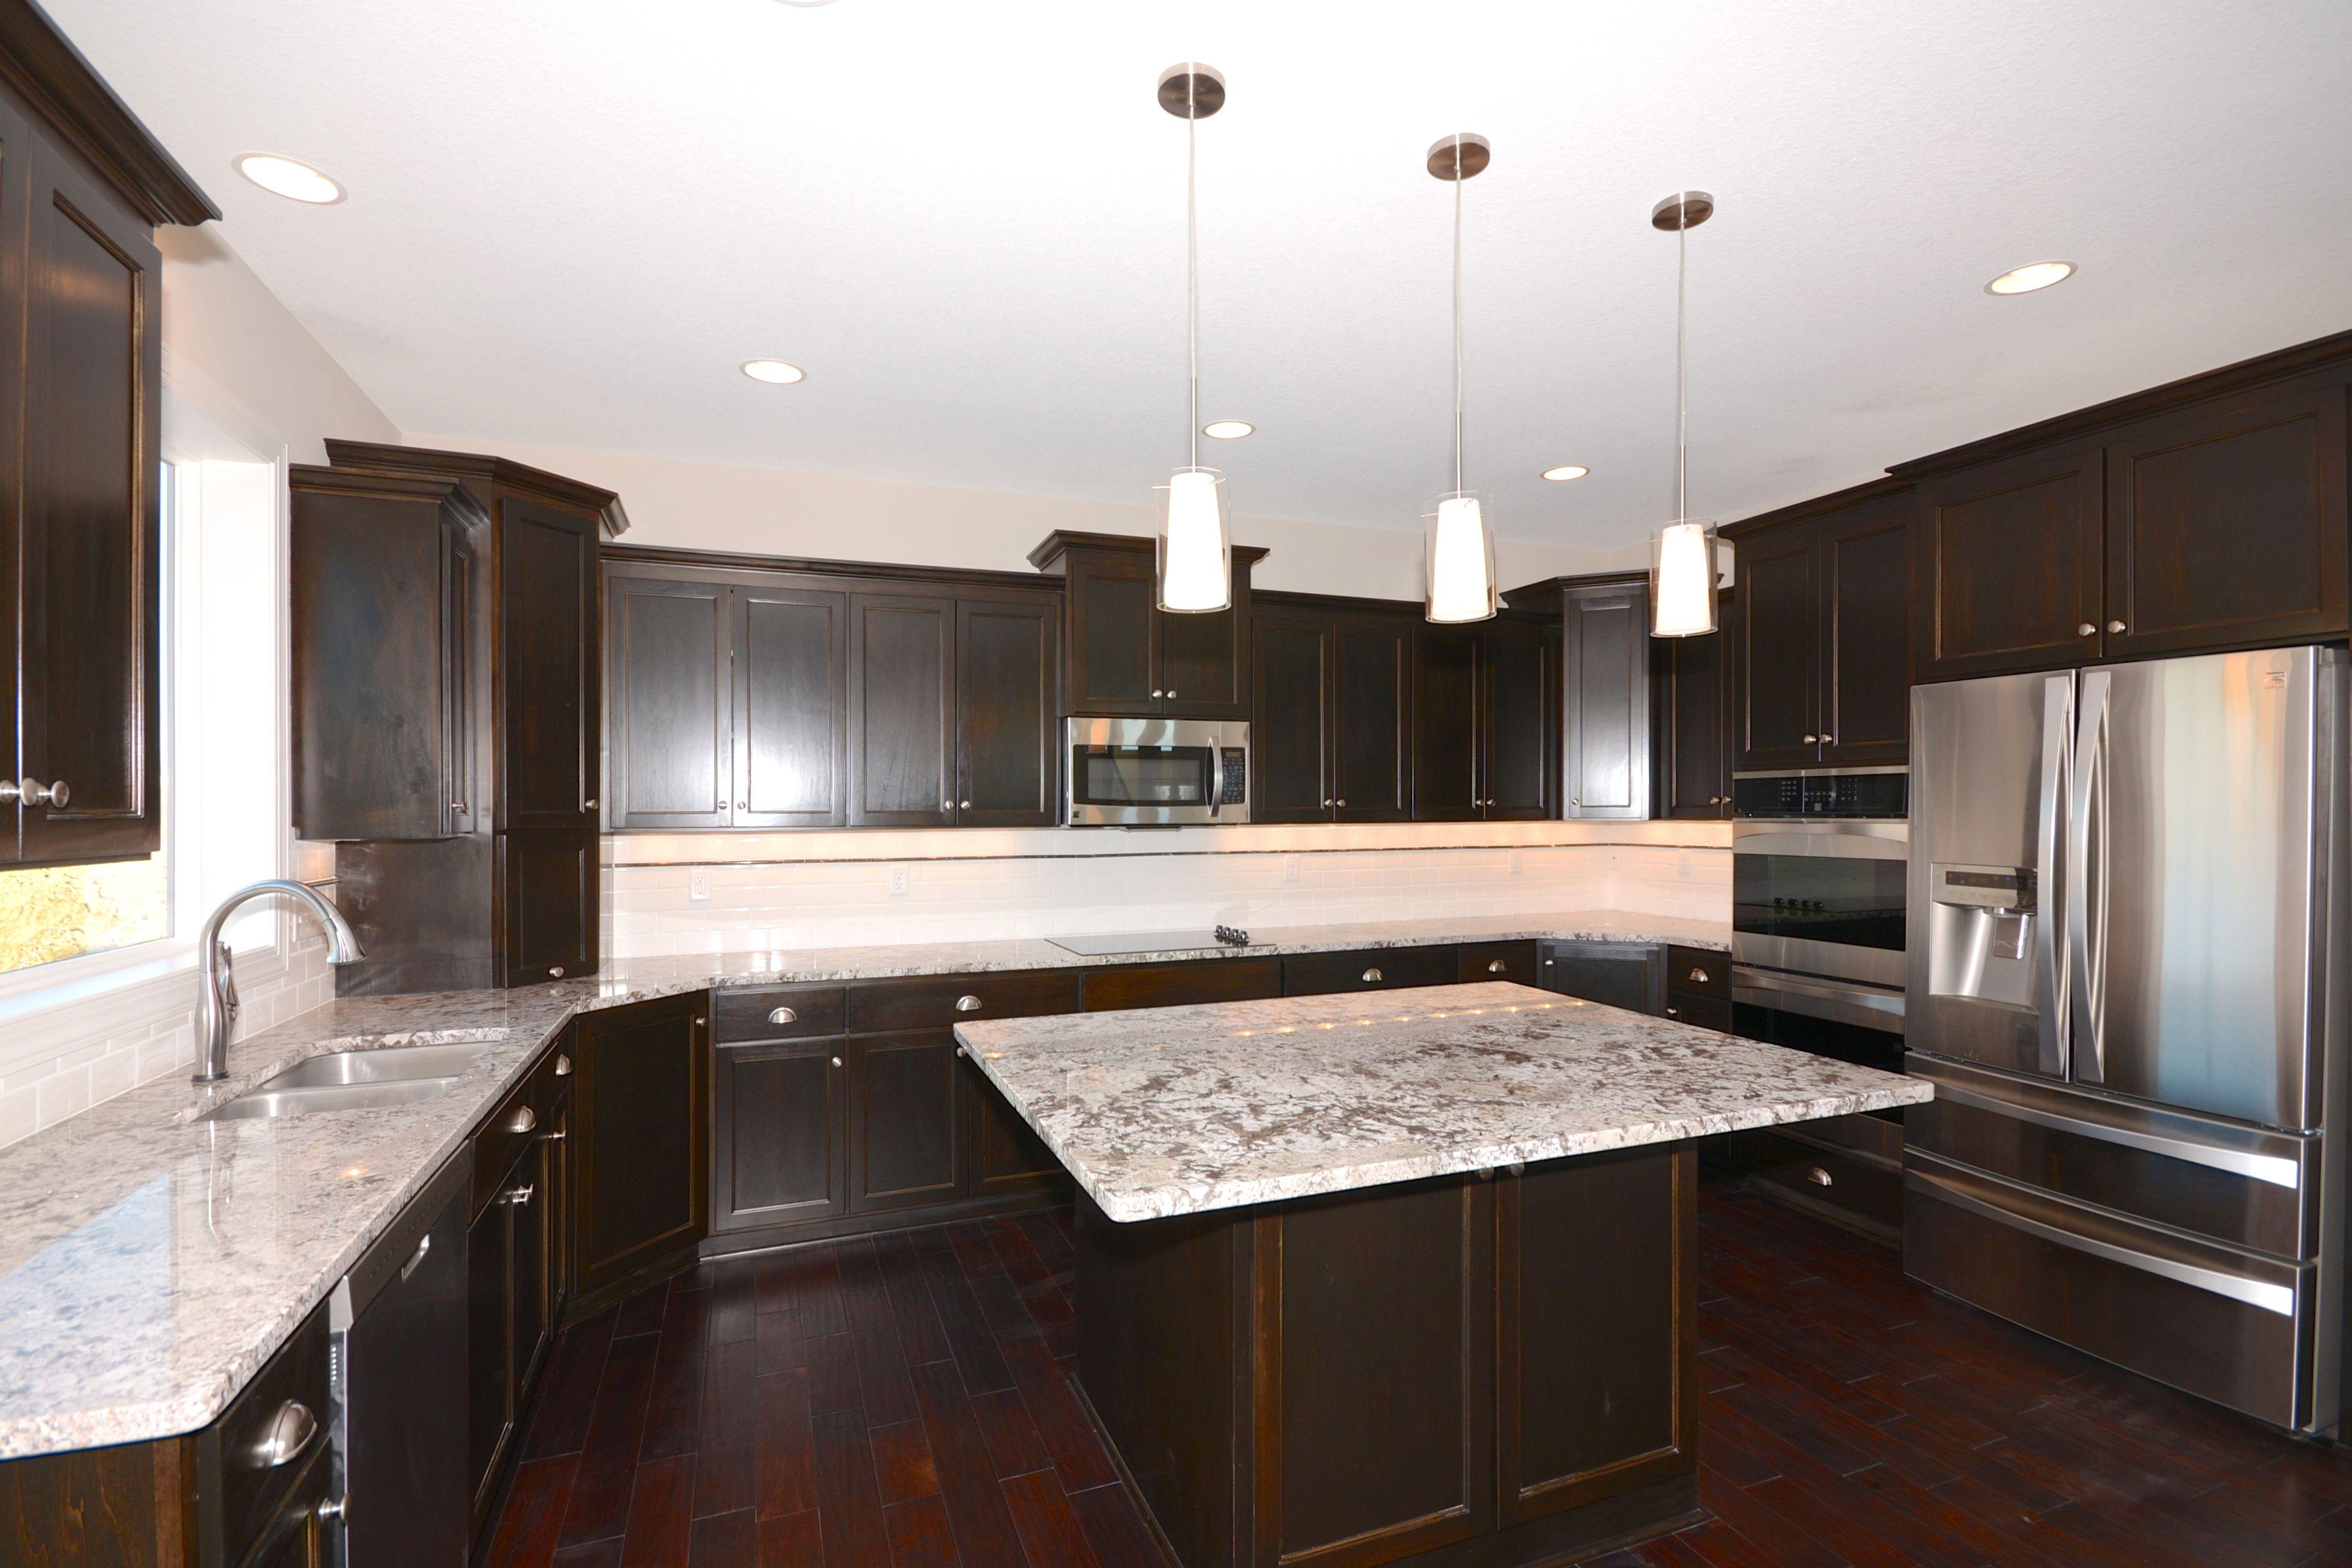 17 Ft Wide Kitchen Poplar Cabinets Black Walnut Stain Client Build 2013 Poplar Cabinets Kitchen Custom Built Homes